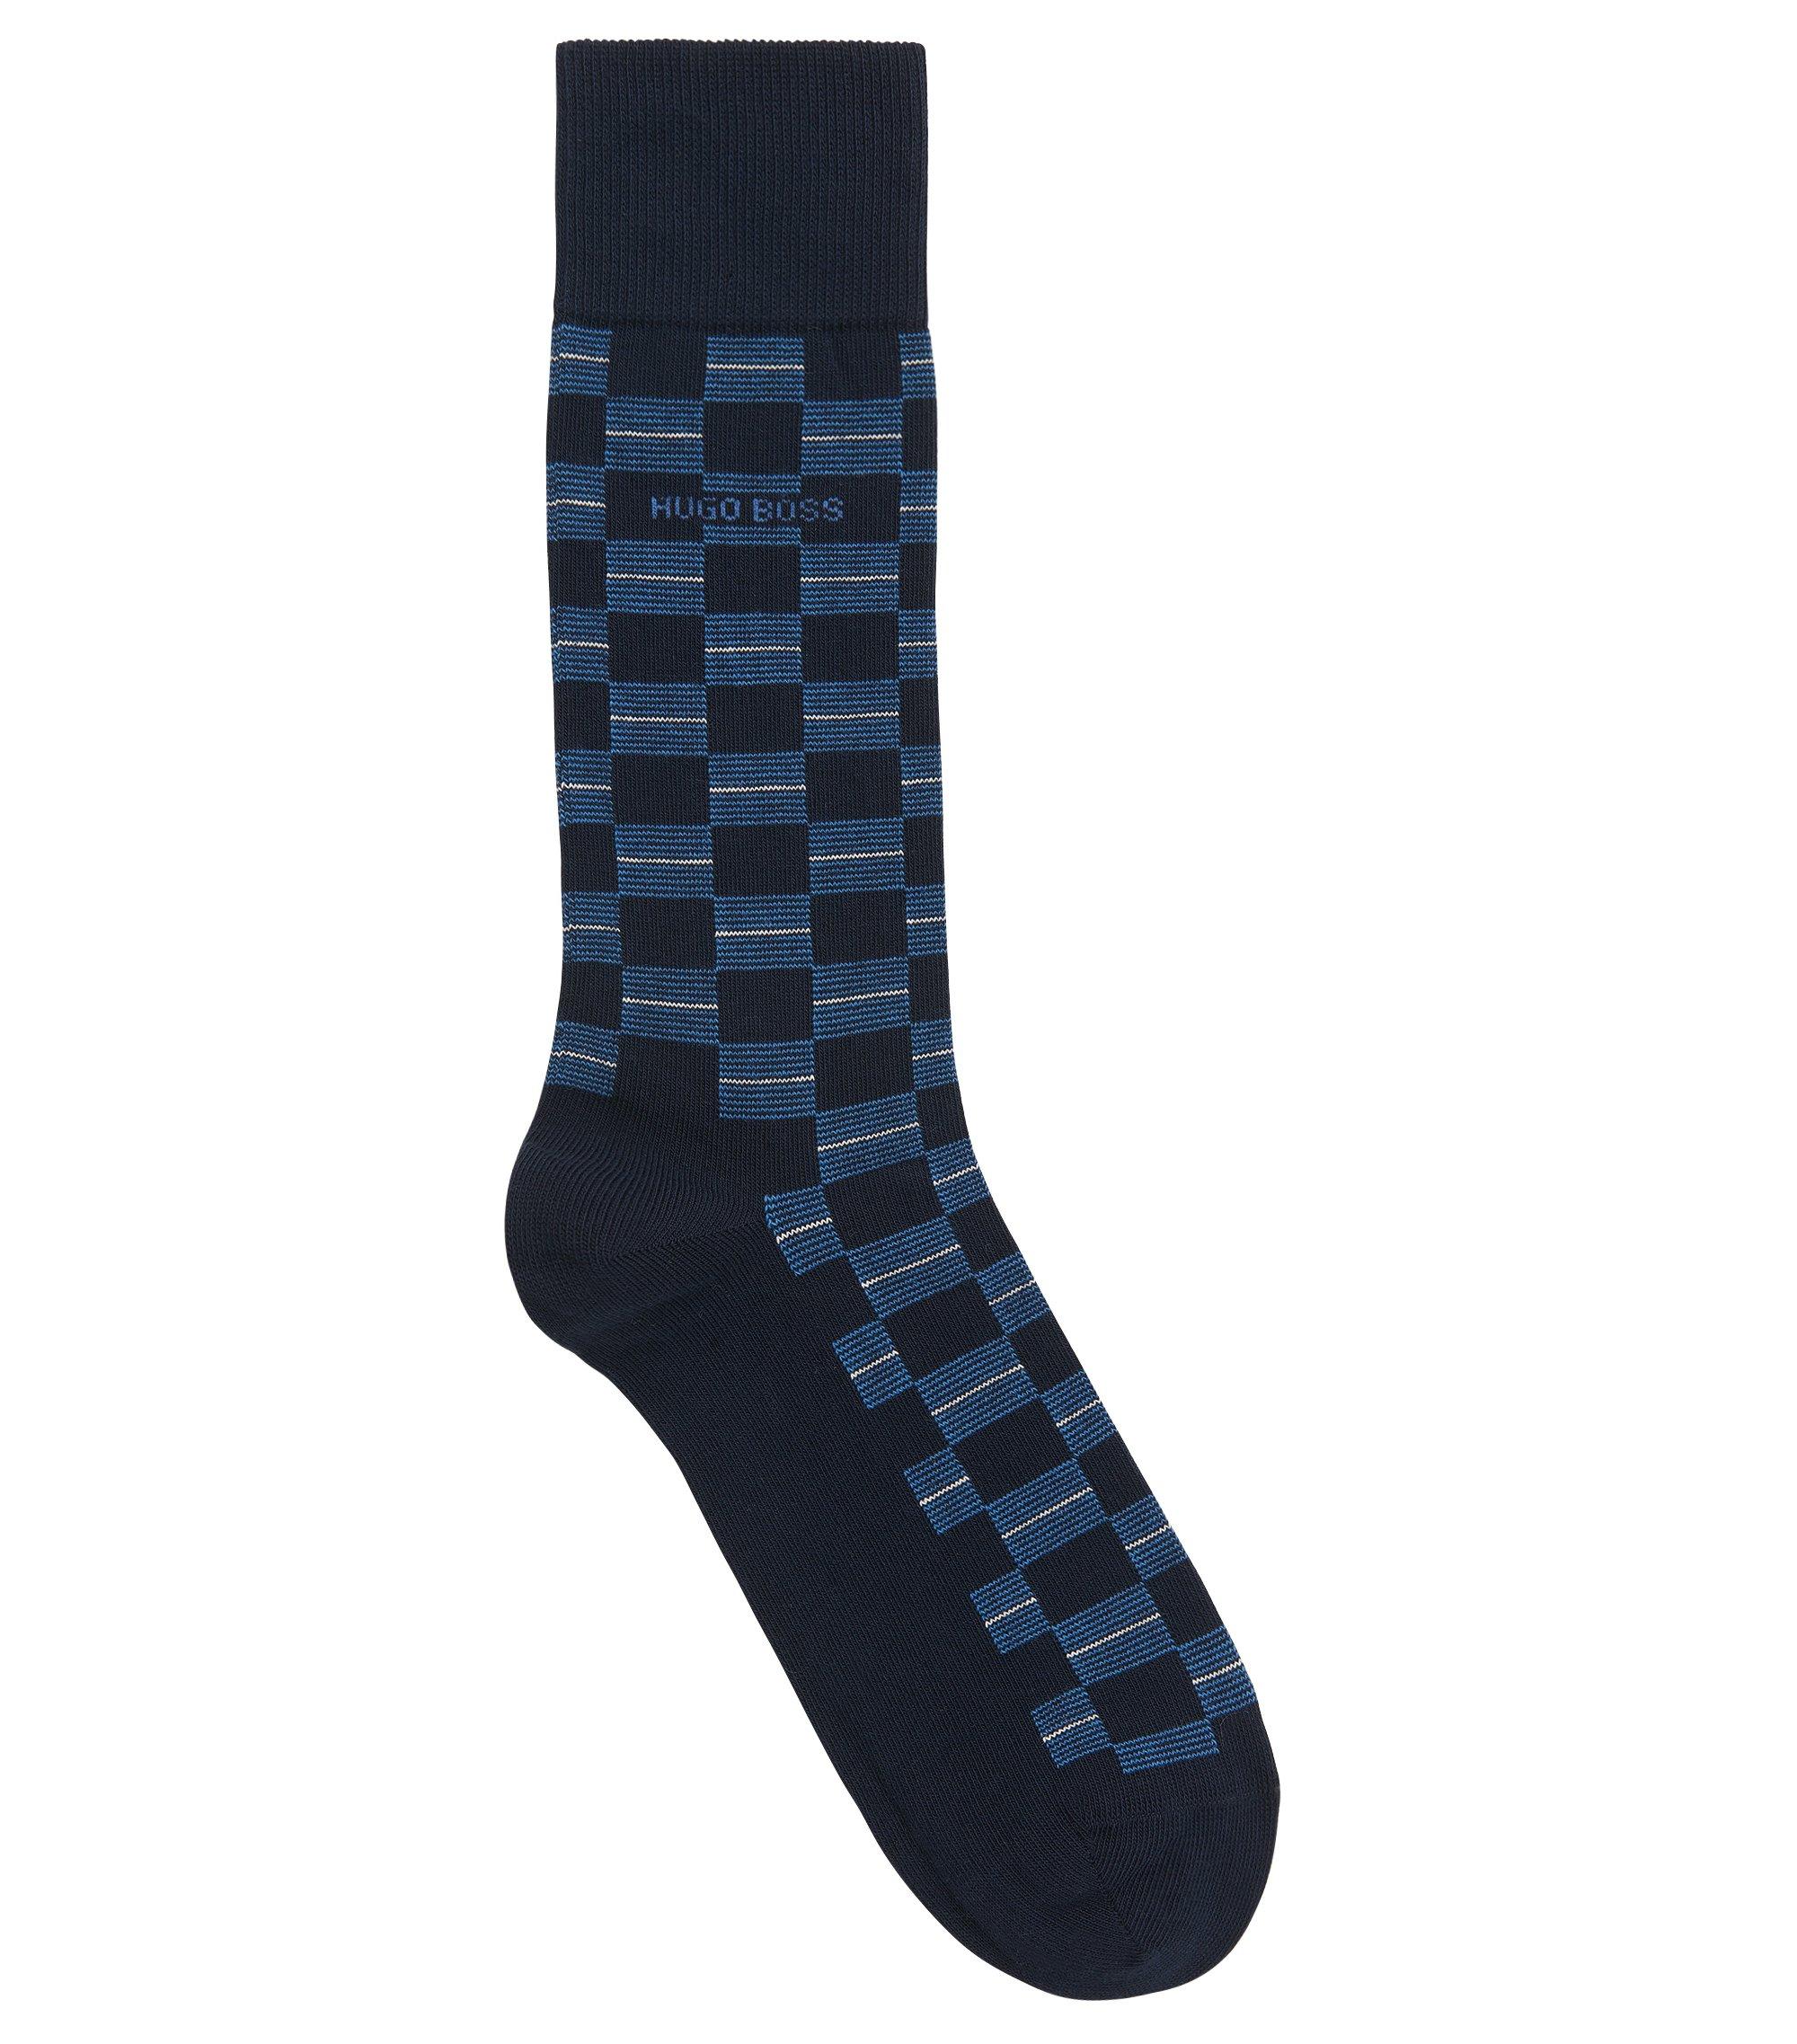 Checked Stretch Cotton Blend Socks | RS Check US CC, Dark Blue